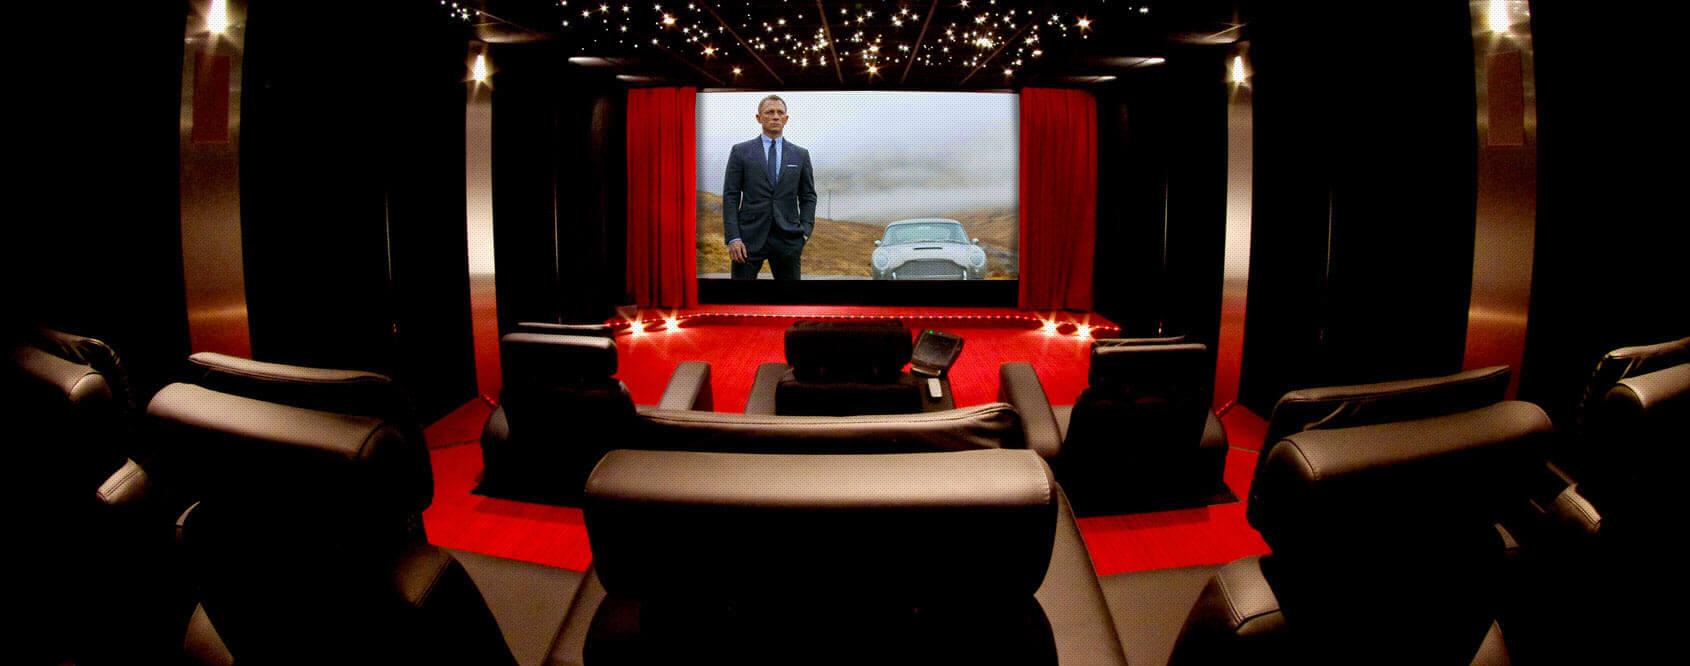 Hocinema l 39 expert de la salle de cin ma priv e la maison - Salle de cinema a la maison ...